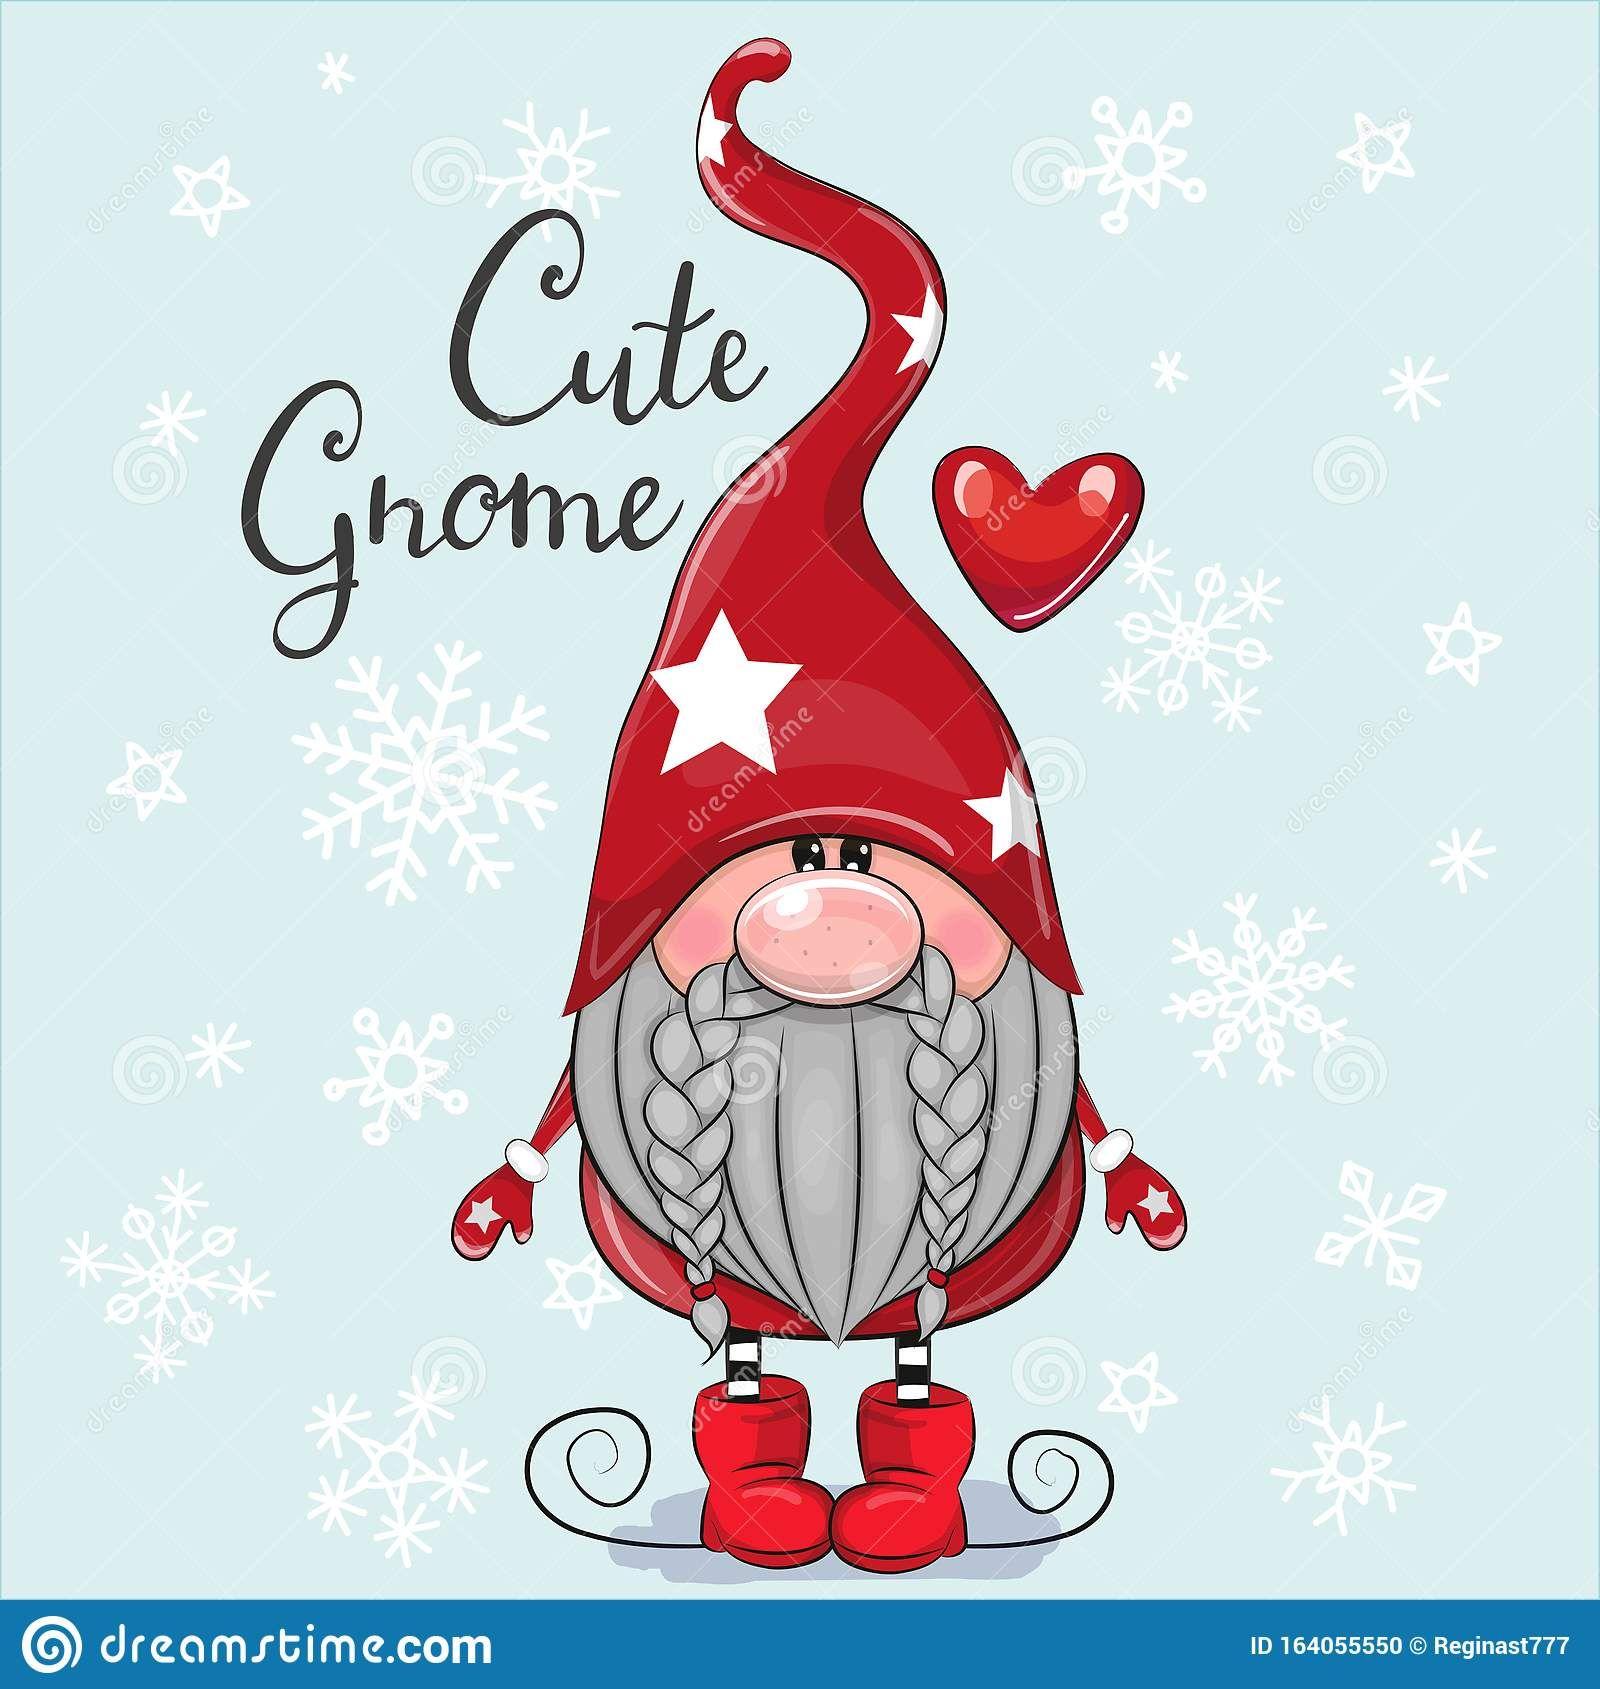 Download 646 Scandinavian Gnome Stock Illustrations